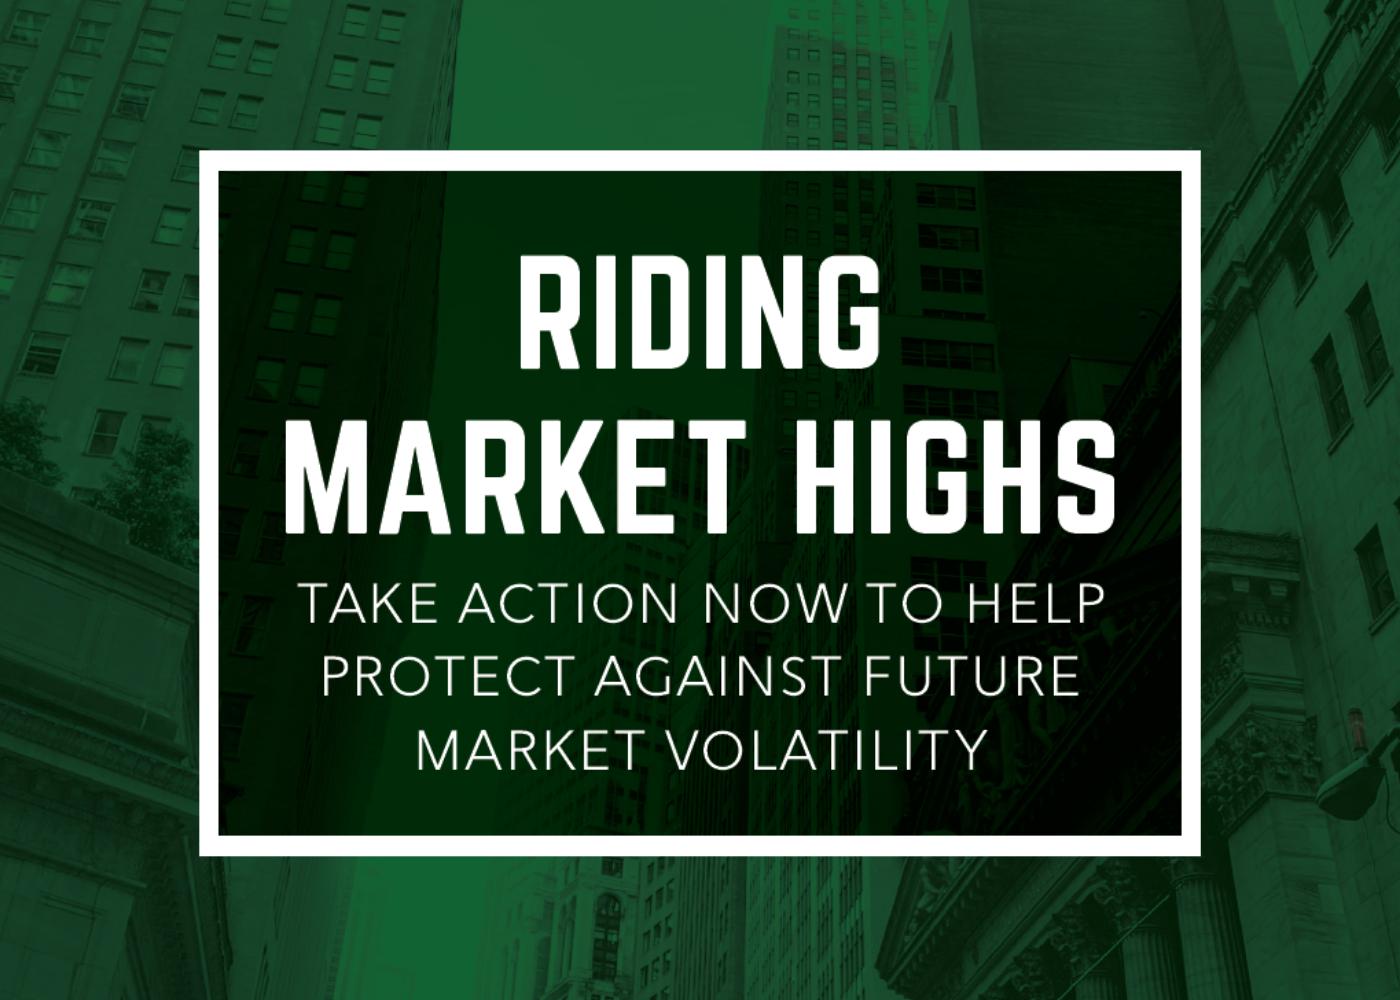 Riding Market Highs Thumbnail